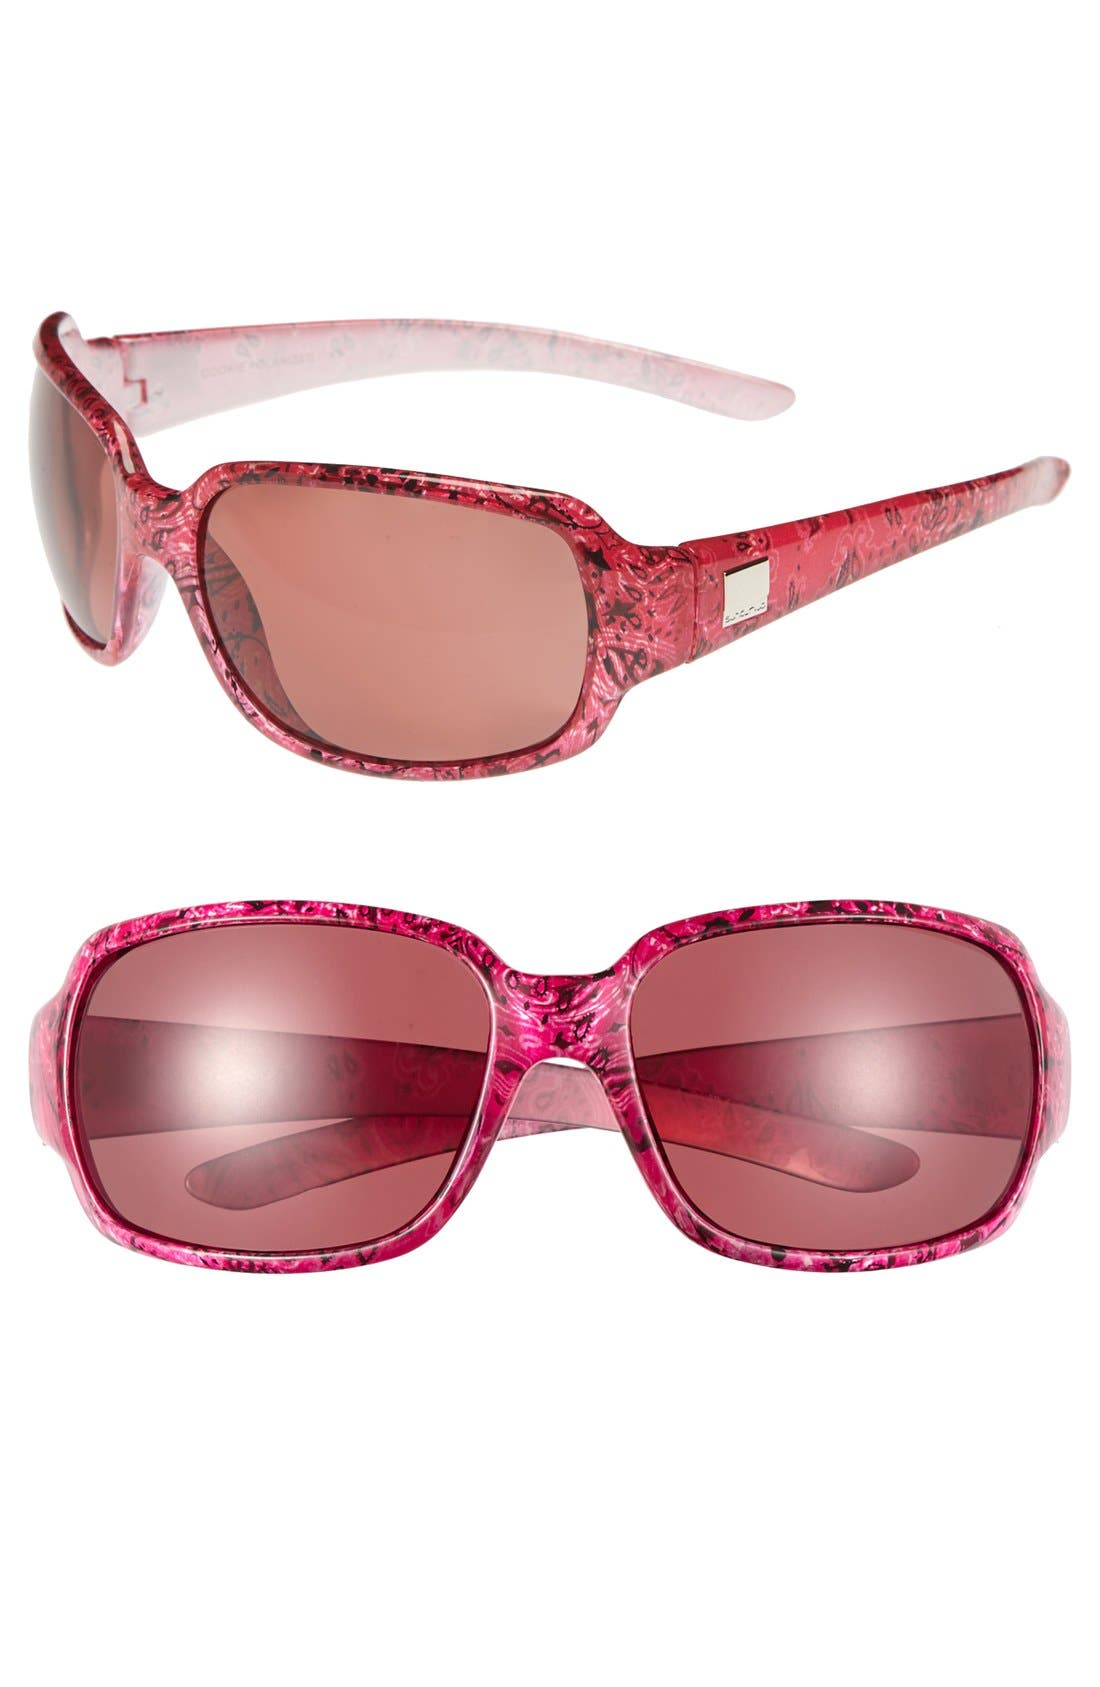 Alternate Image 1 Selected - Suncloud 'Cookie' Polarized Sunglasses